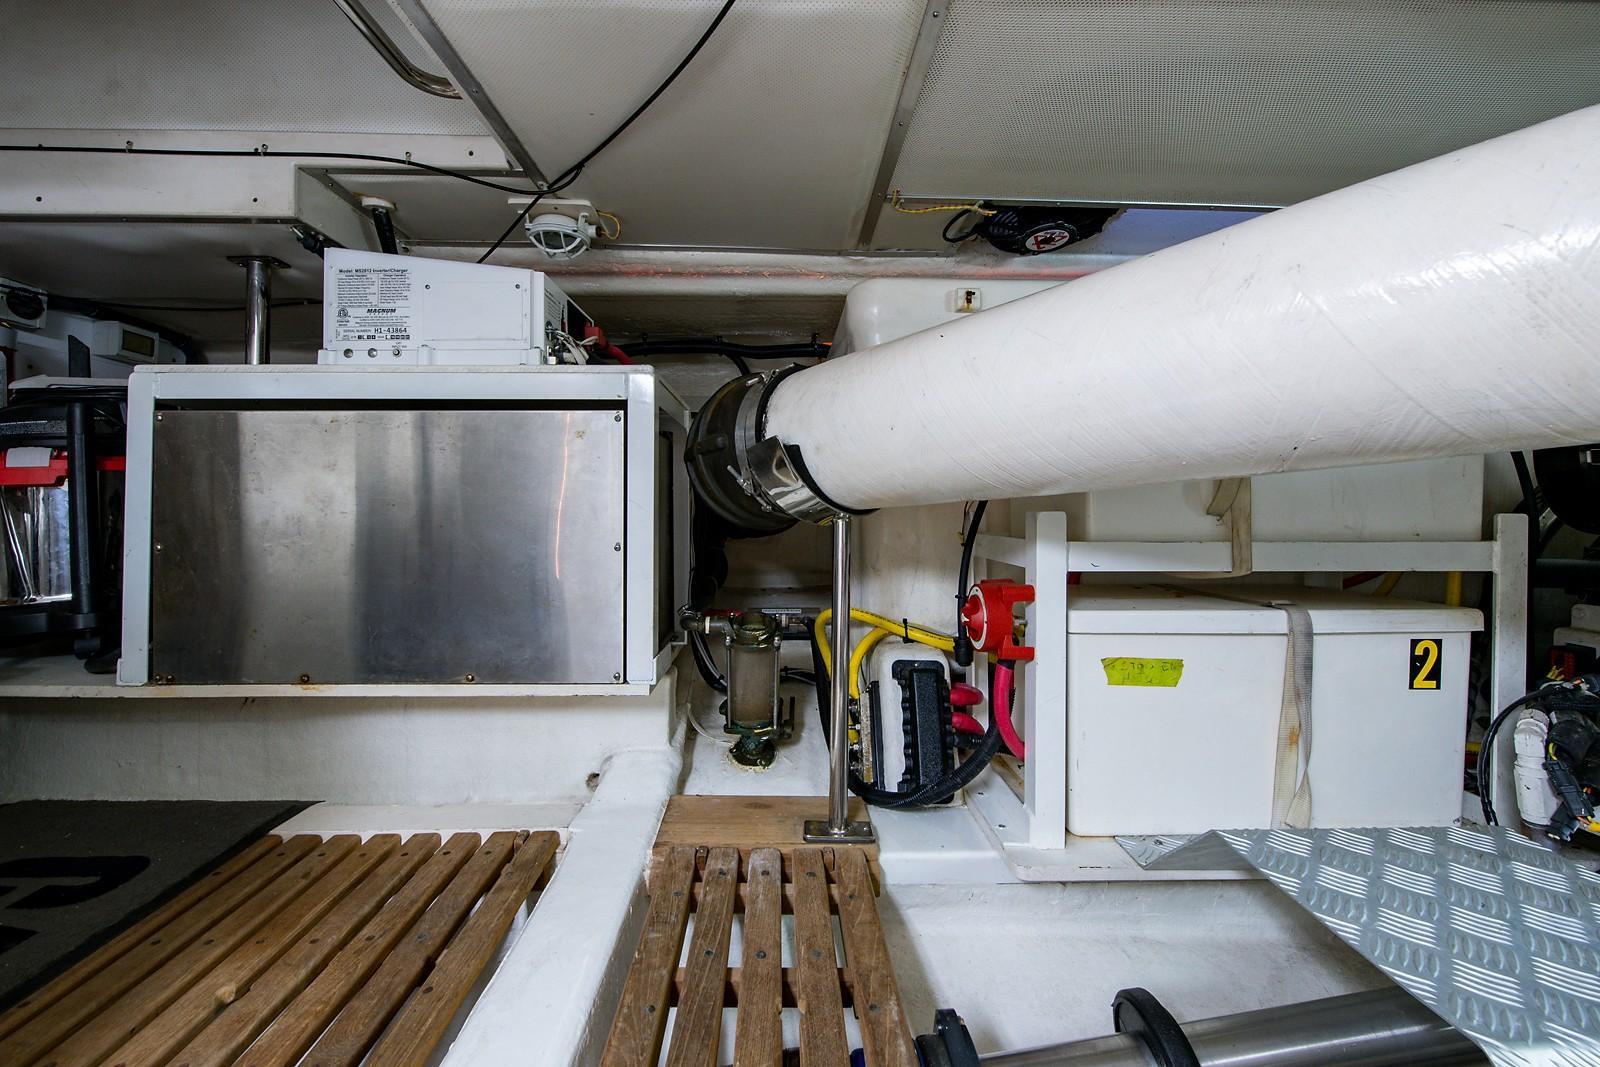 47 Grand Banks Karma 2006 Fort Lauderdale | Denison Yacht Sales